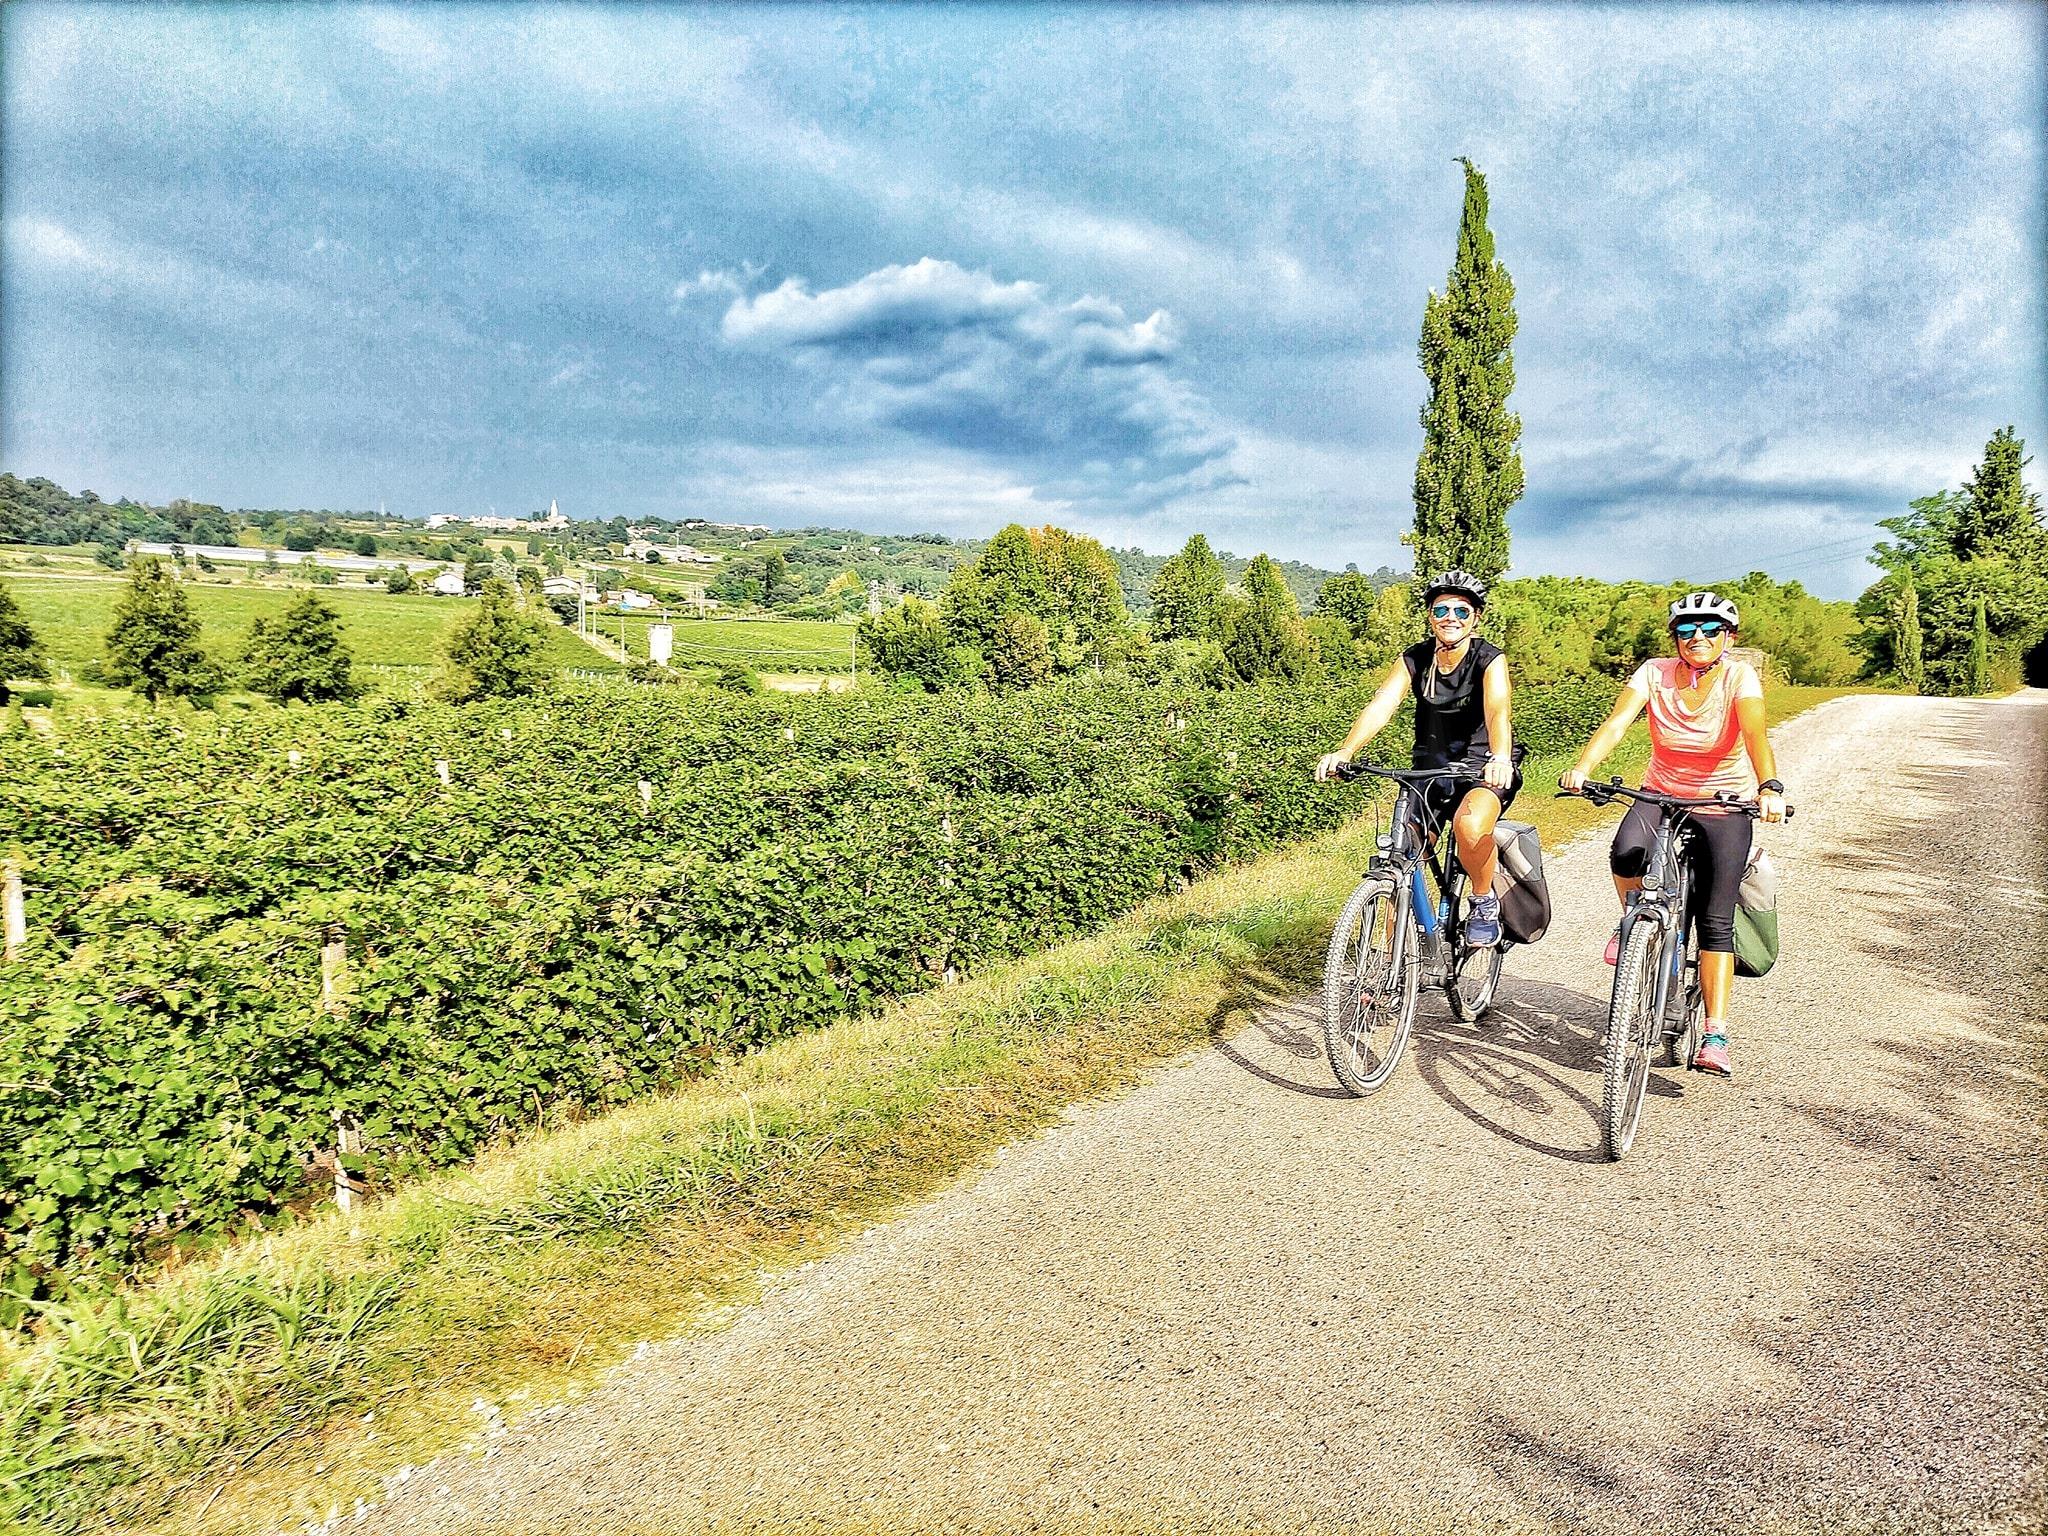 Bike Tour nei dintorni del Lago di Garda - Garda E-motion